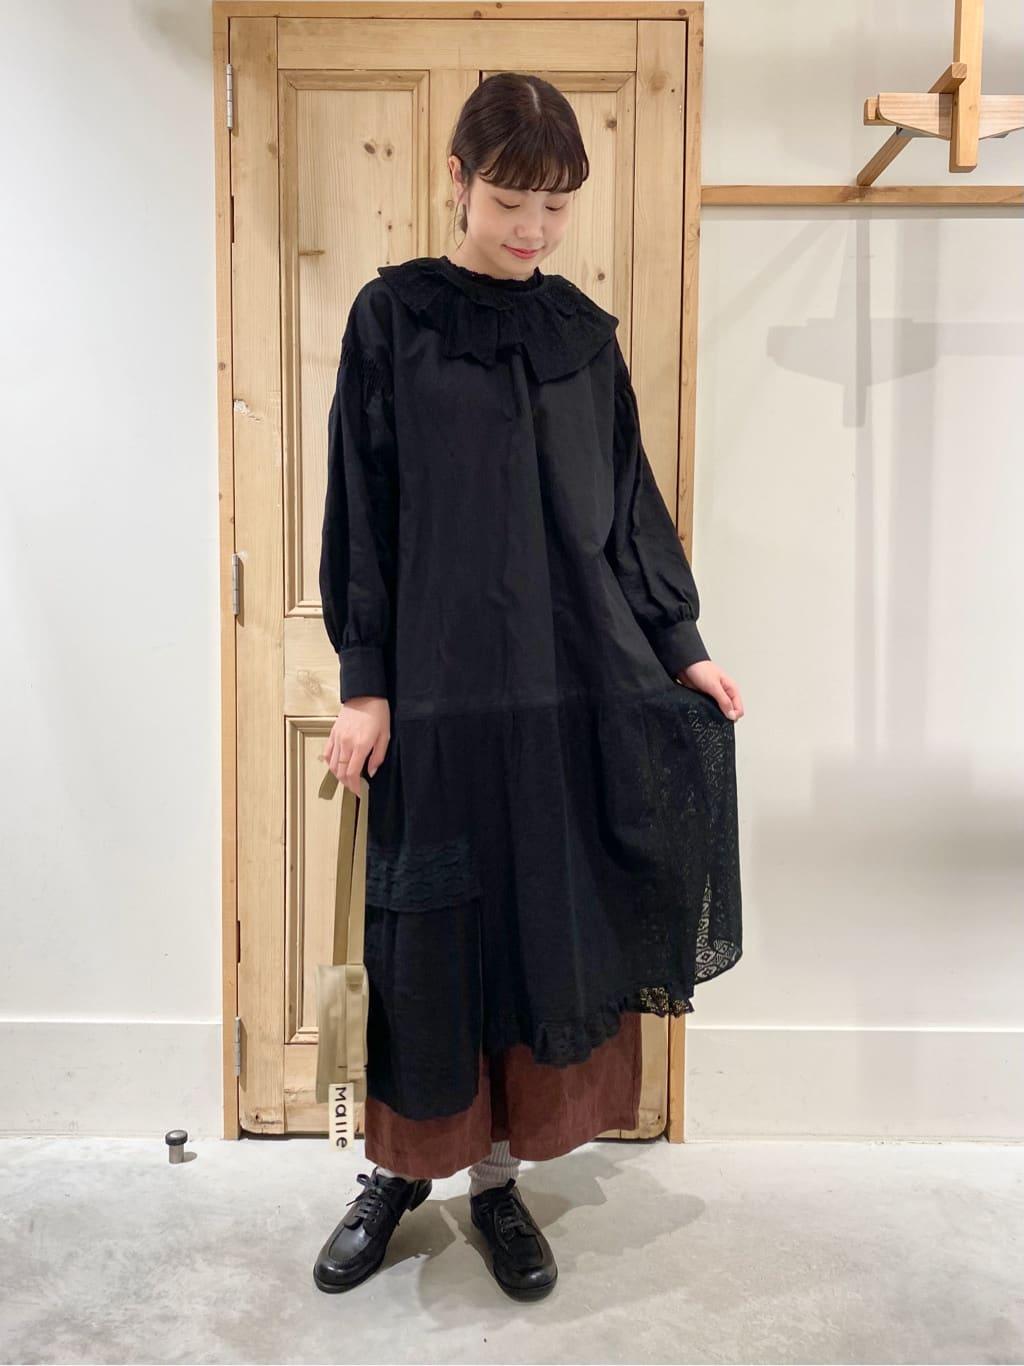 Malle chambre de charme 調布パルコ 身長:167cm 2021.09.07